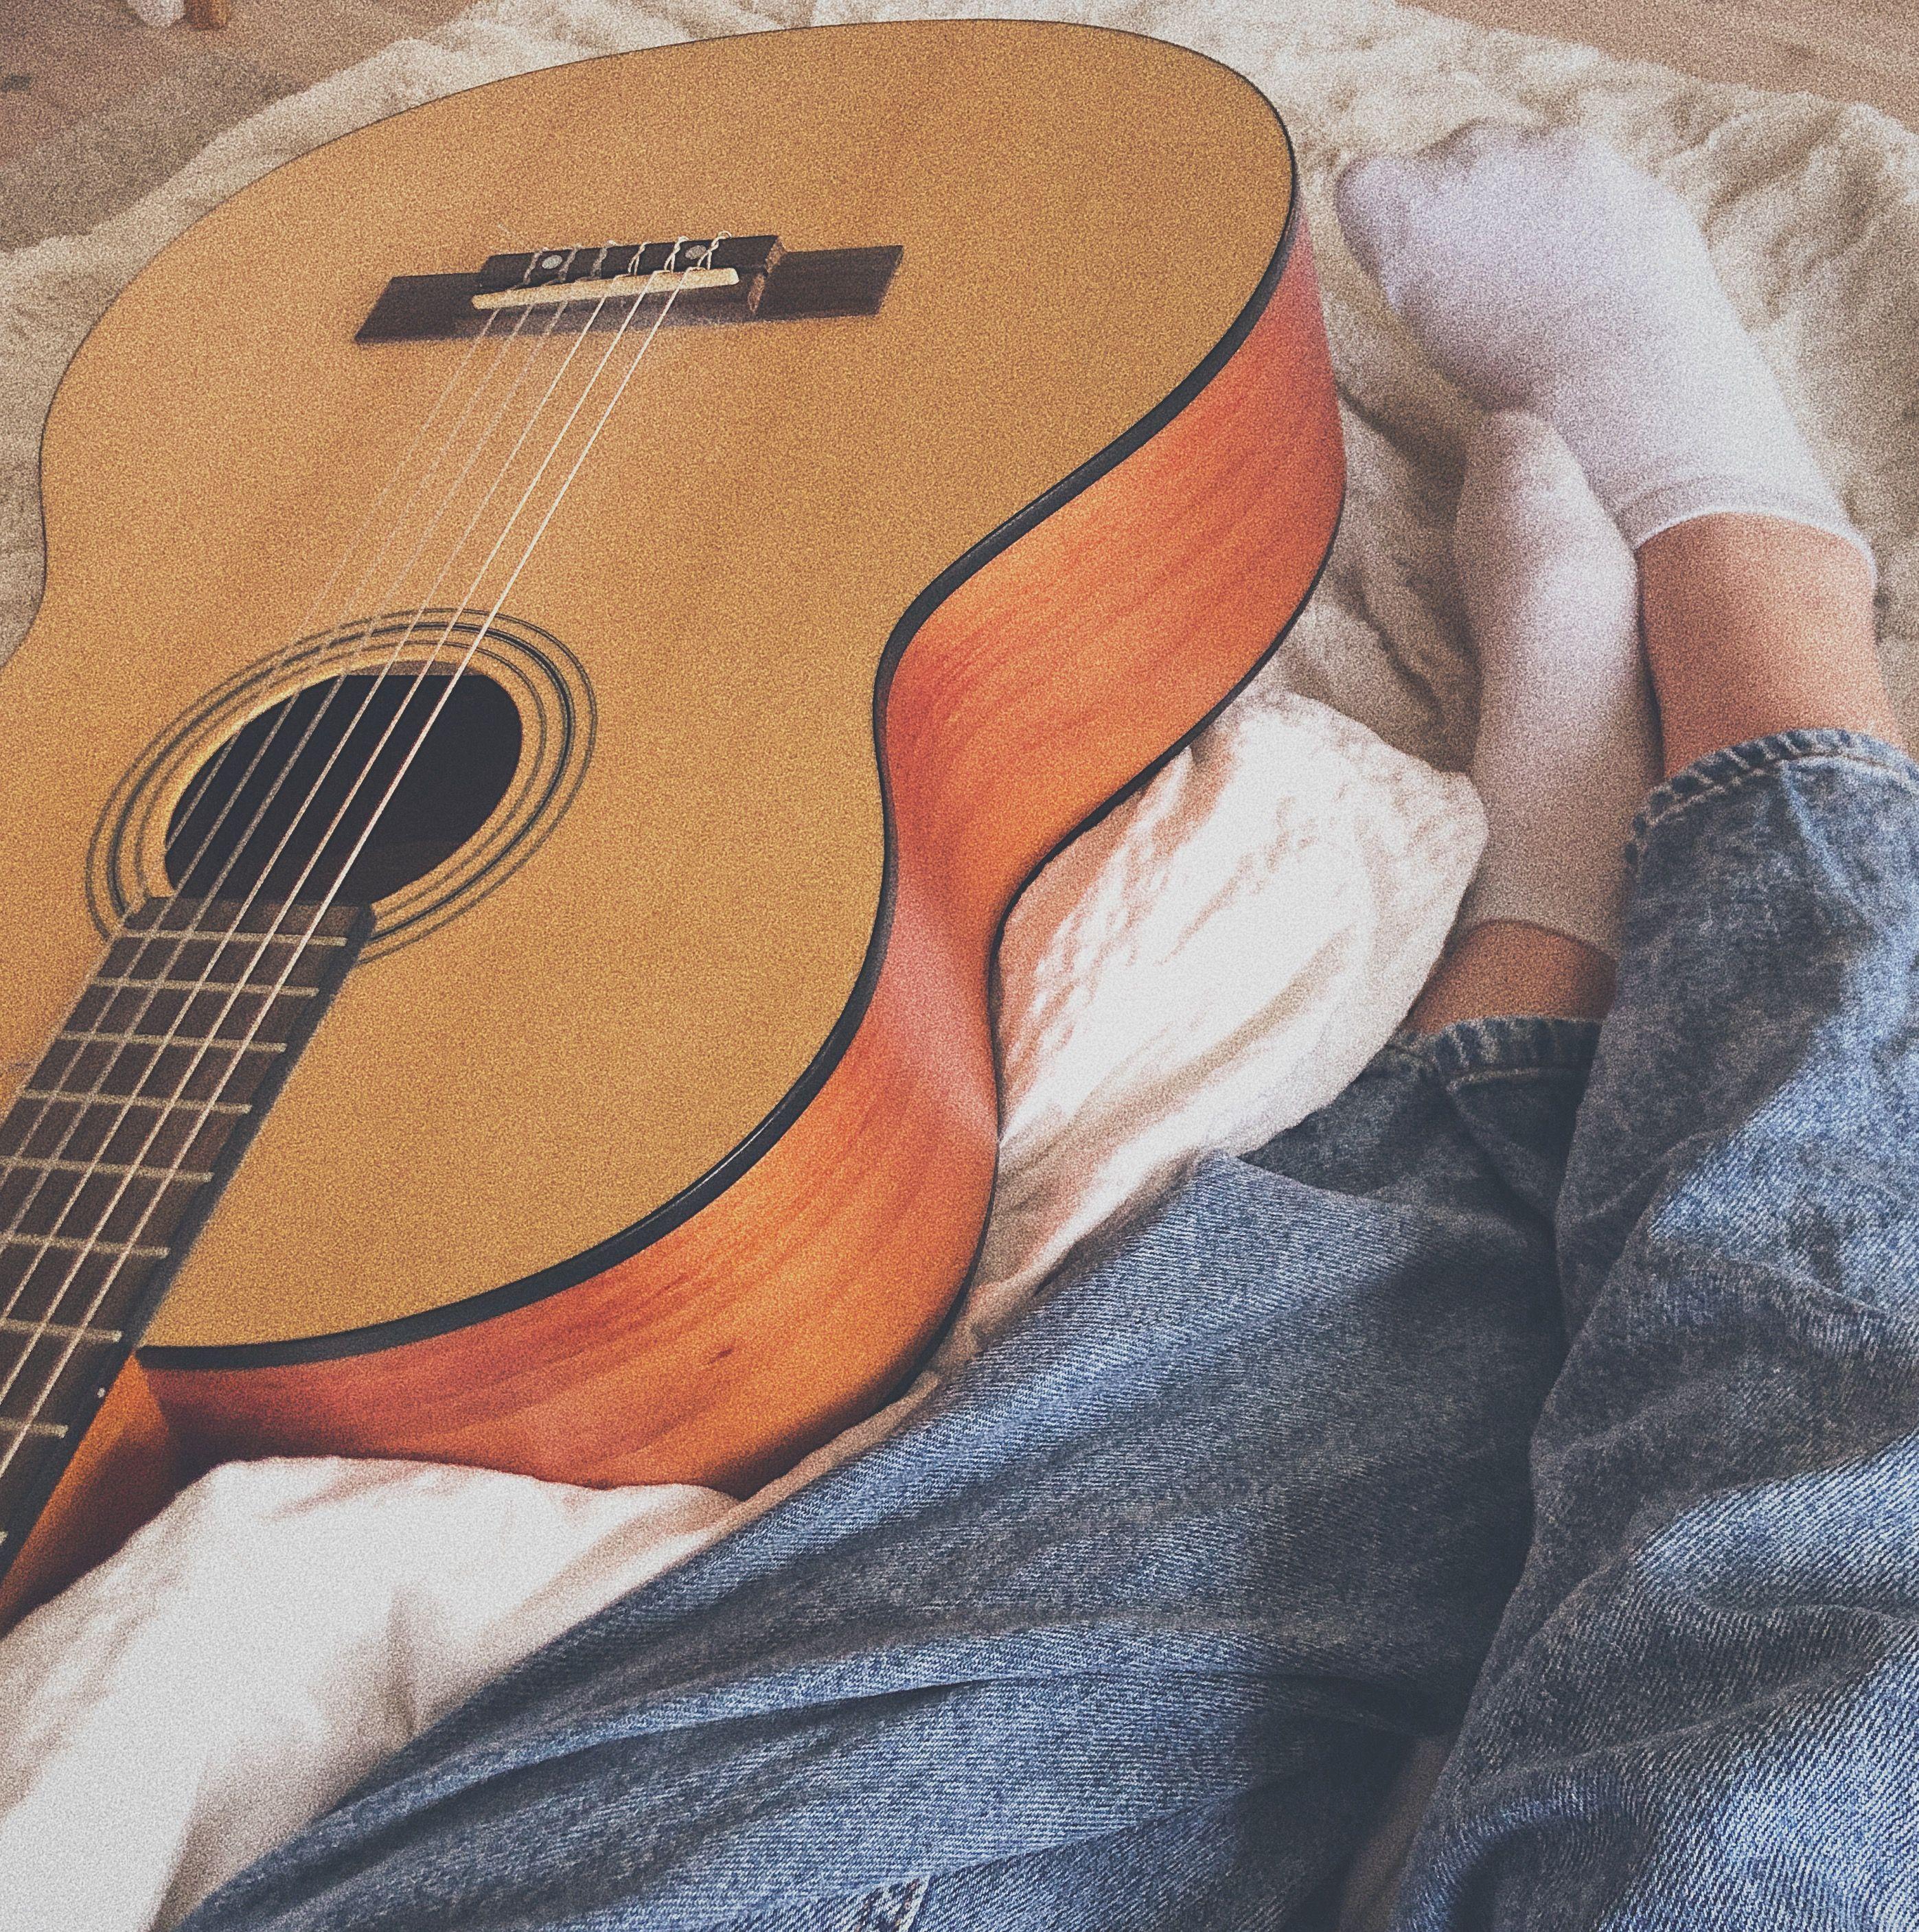 Acoustic Guitar Aesthetic Photo Acoustic Guitar Photography Acoustic Guitar Guitar